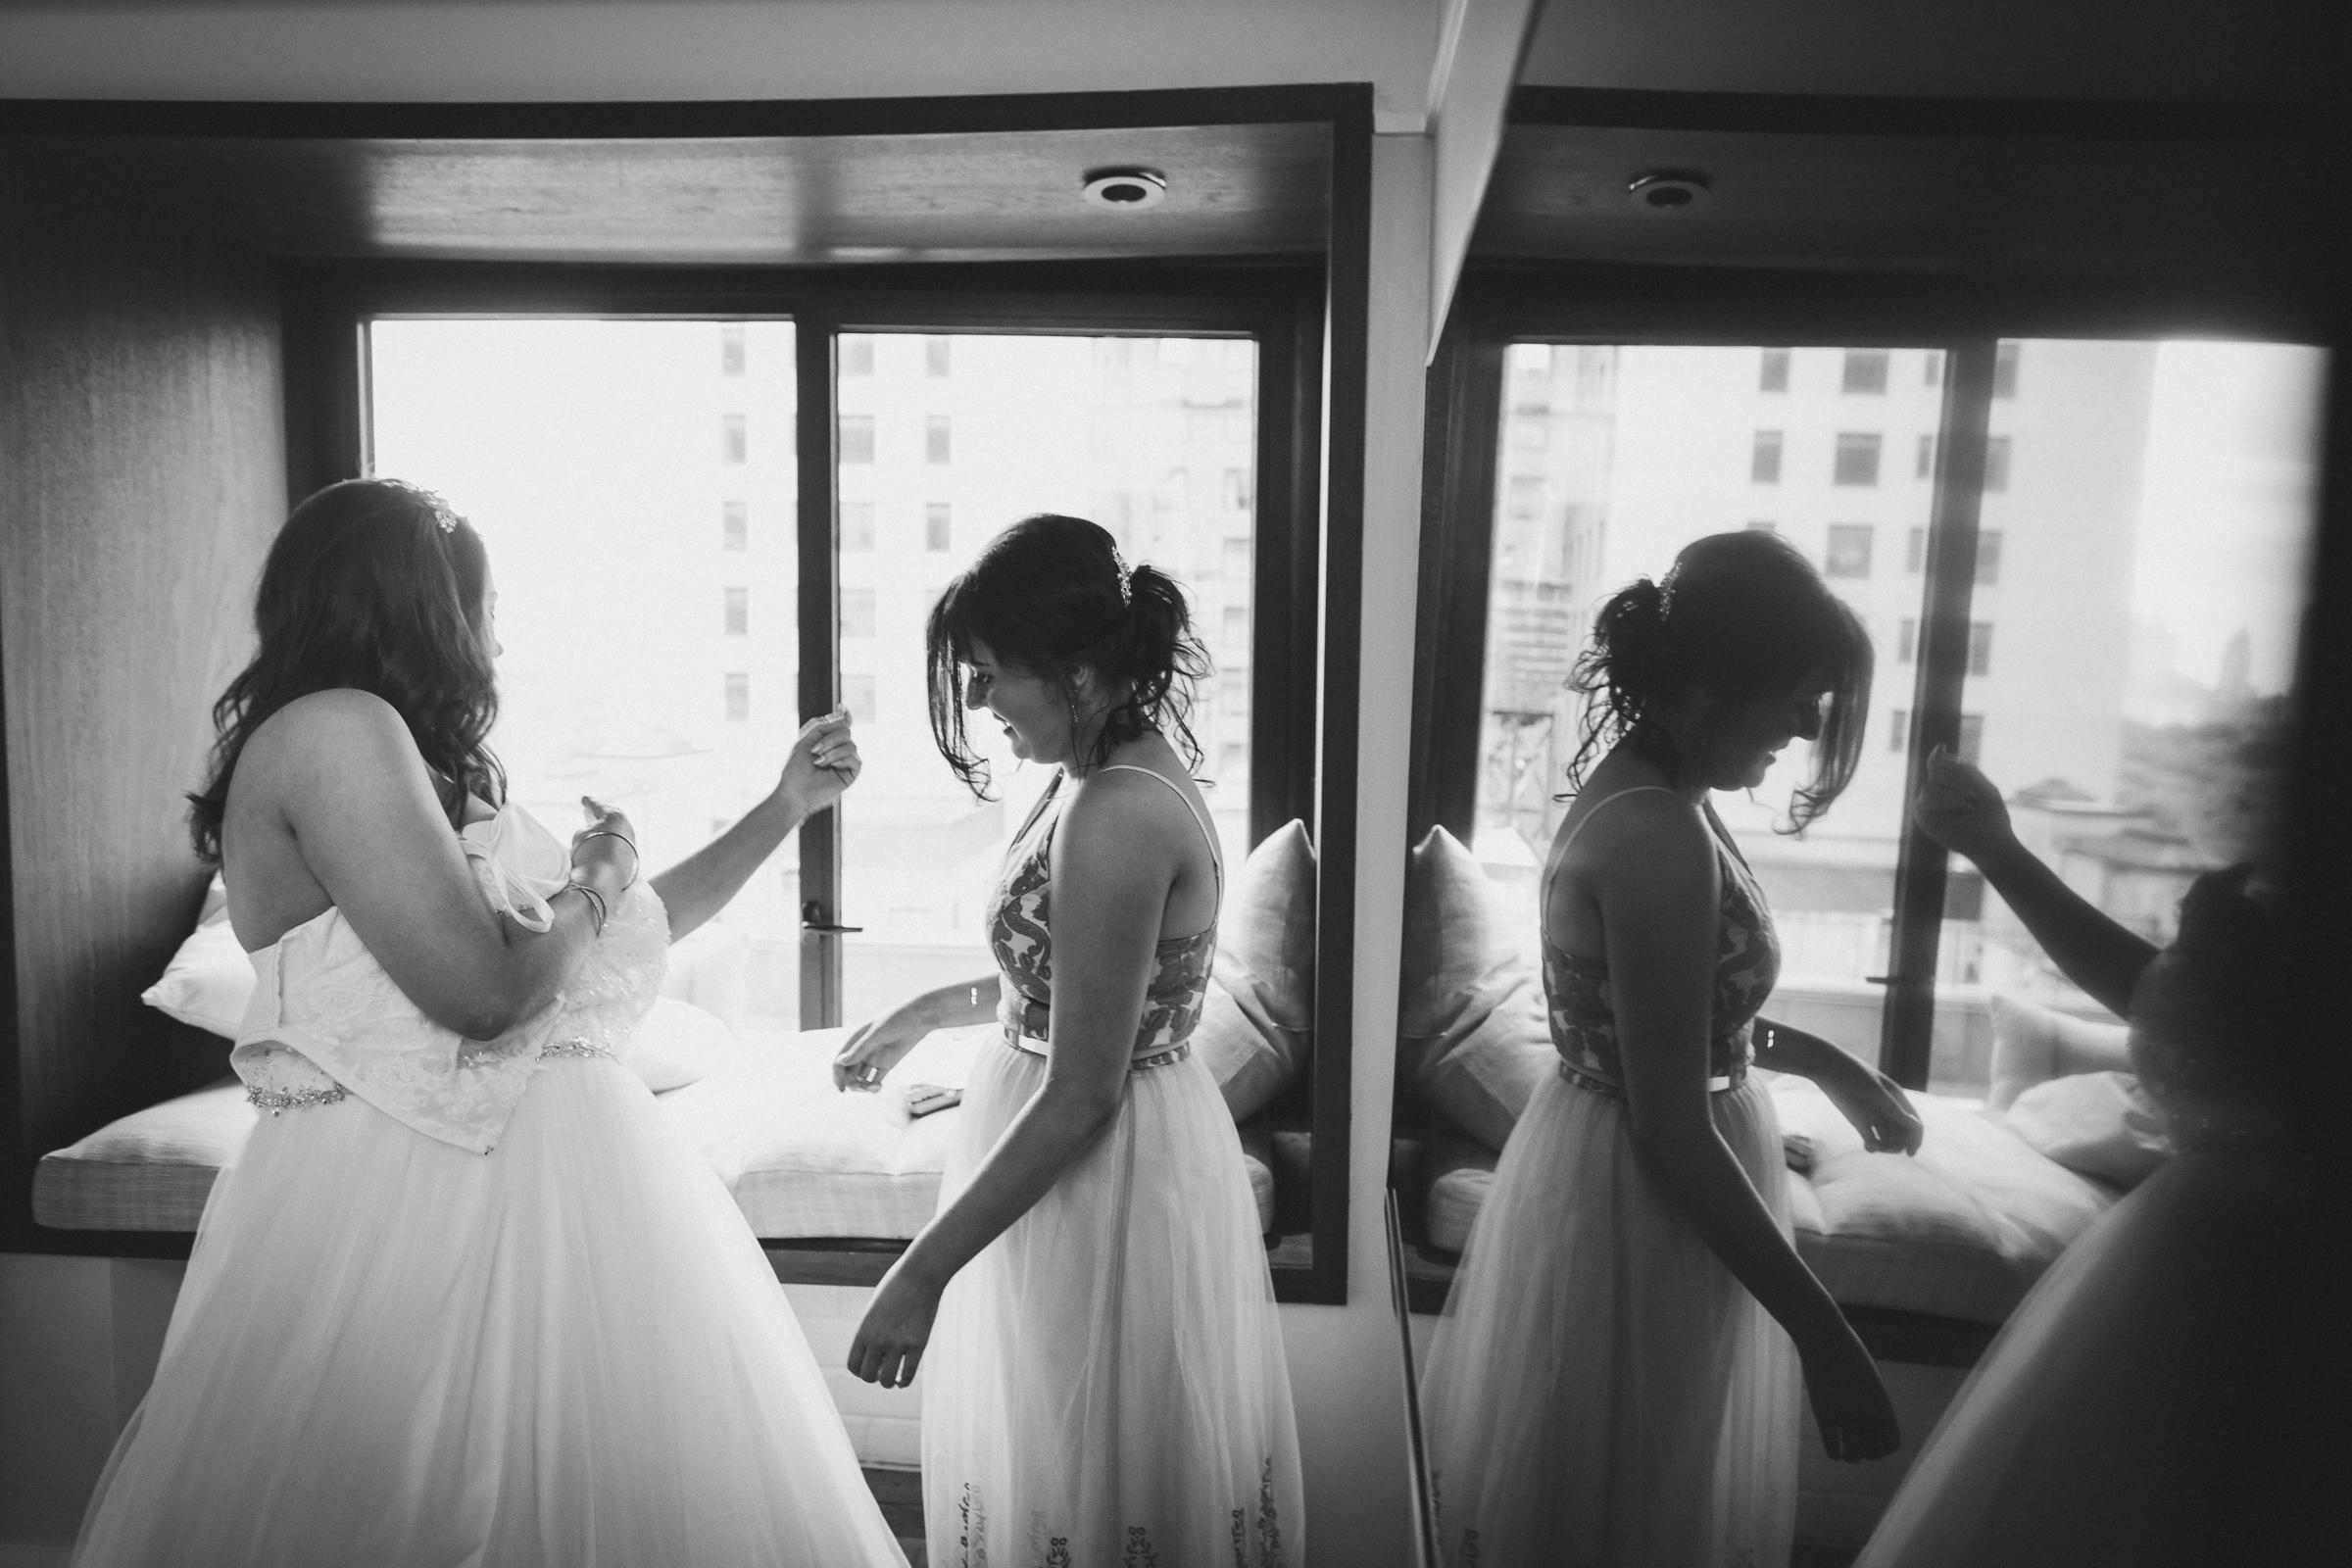 NYC-Central-Park-Elopement-New-York-Documentary-Wedding-Photographer-Dumbo-Brooklyn-Bridge-Park--2.jpg